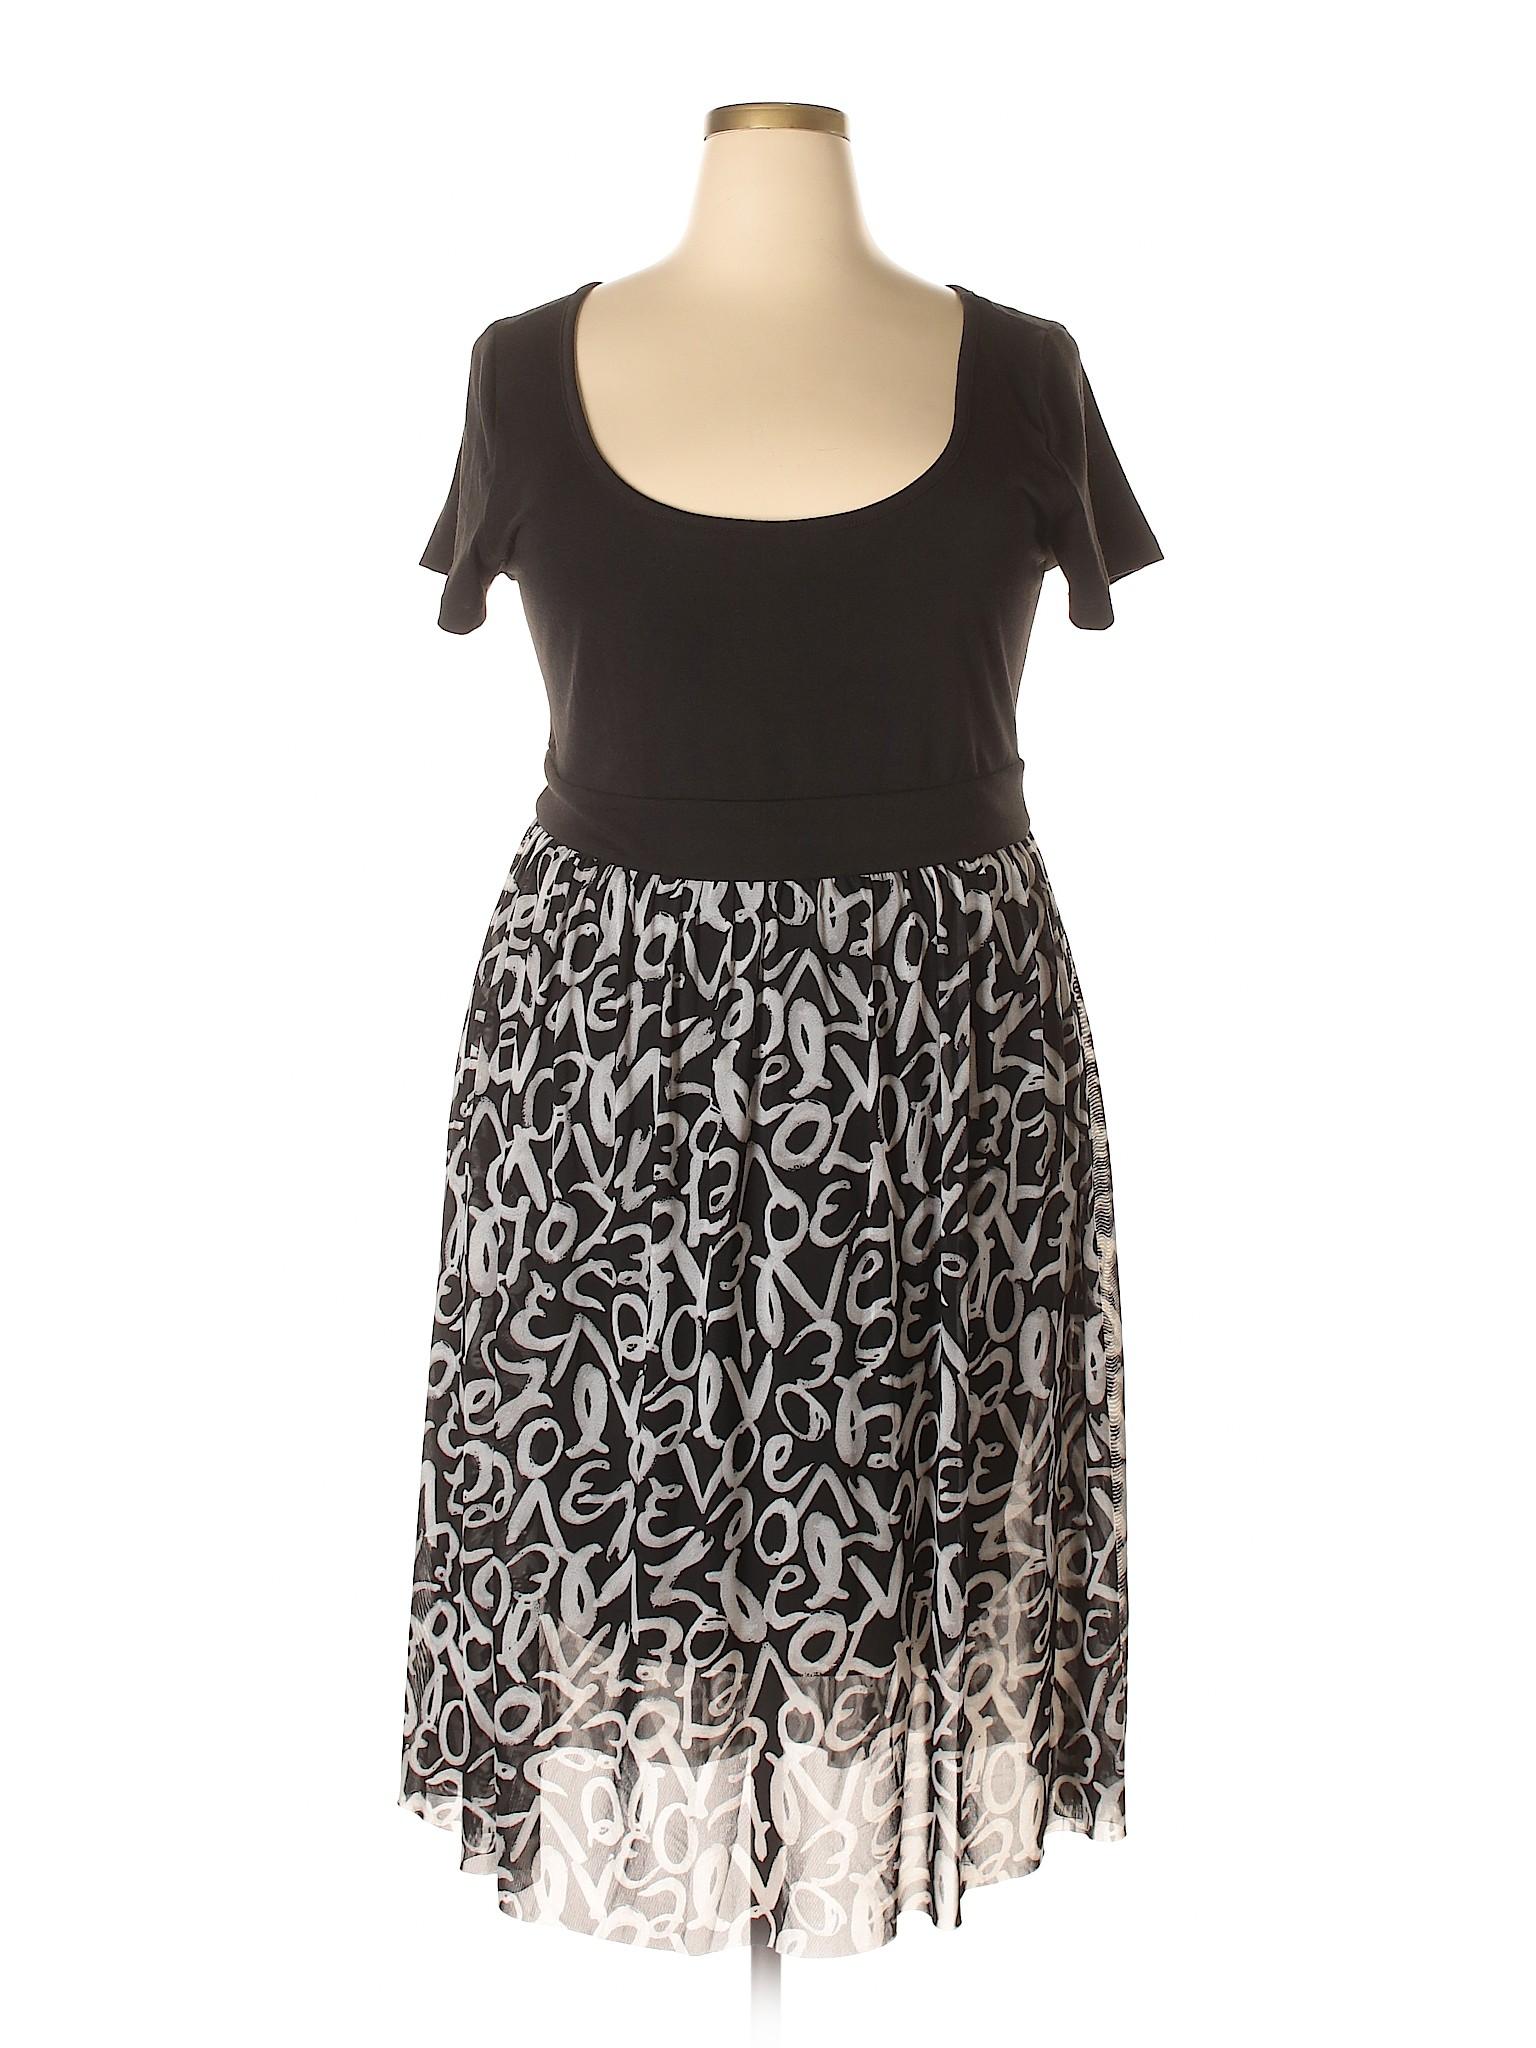 Dress Selling Torrid Selling Torrid Casual Bg7qI1w